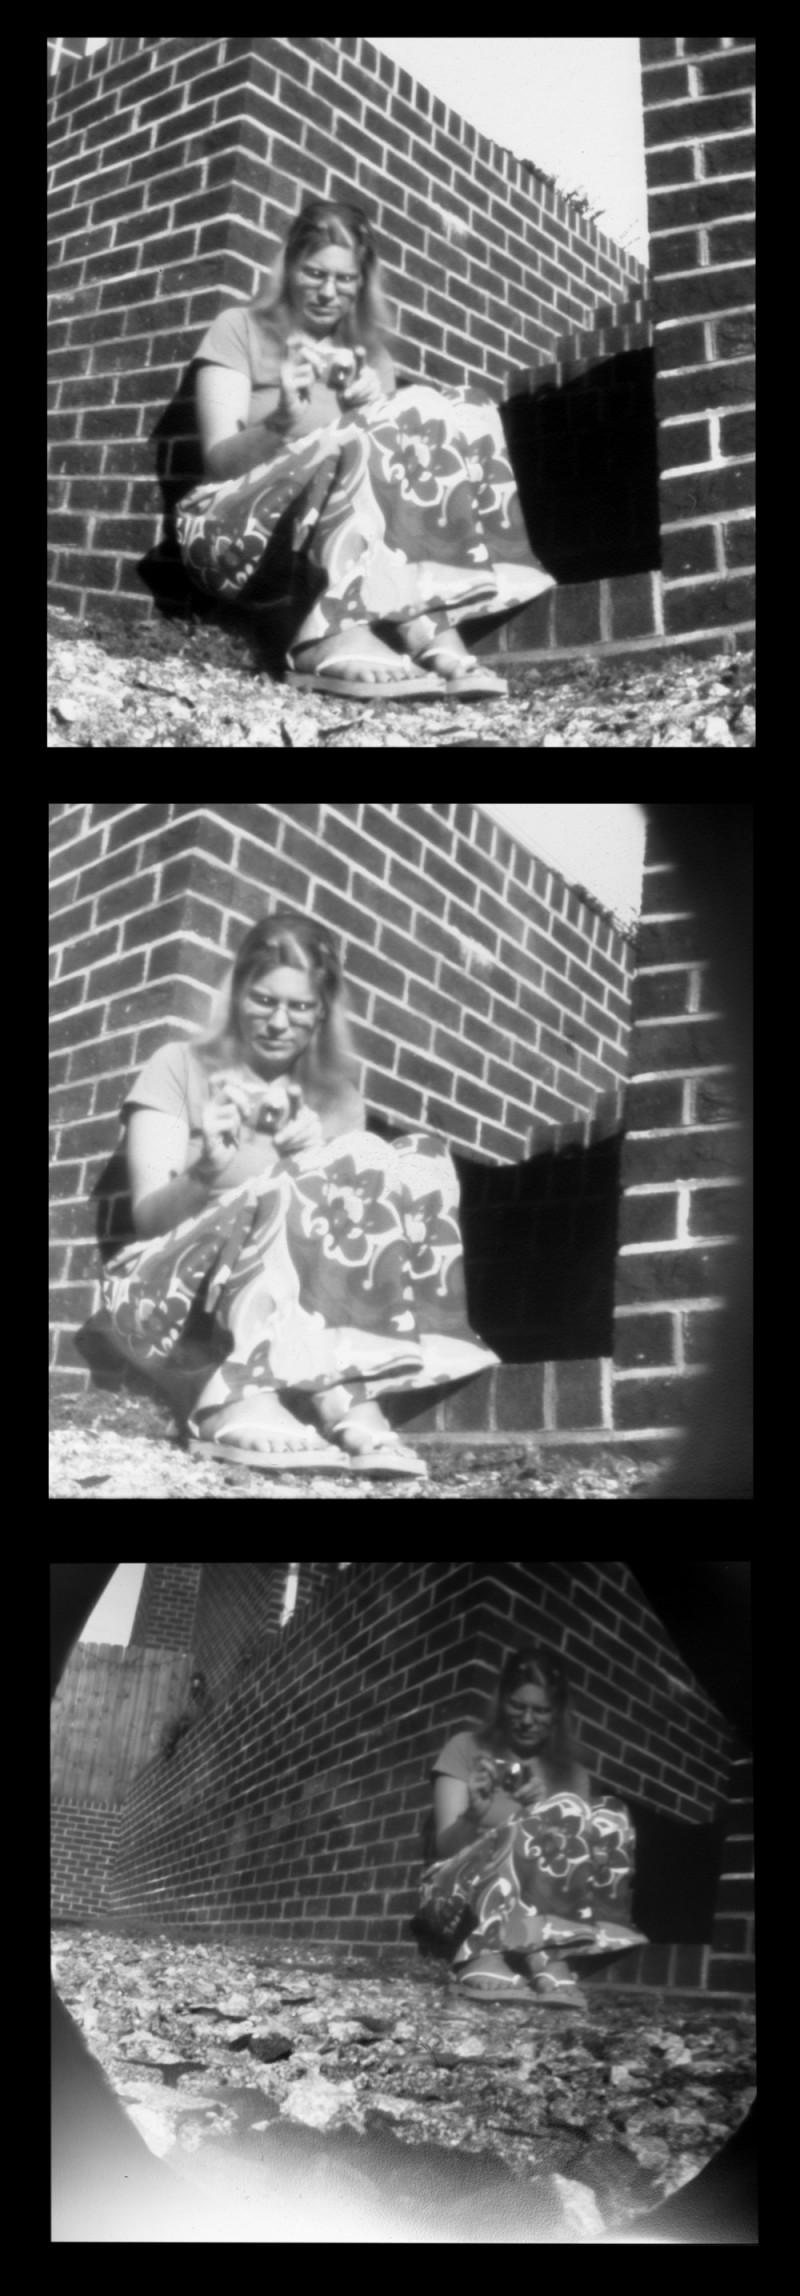 pinhole ceramic cameras pottery wheel-thrown b-w